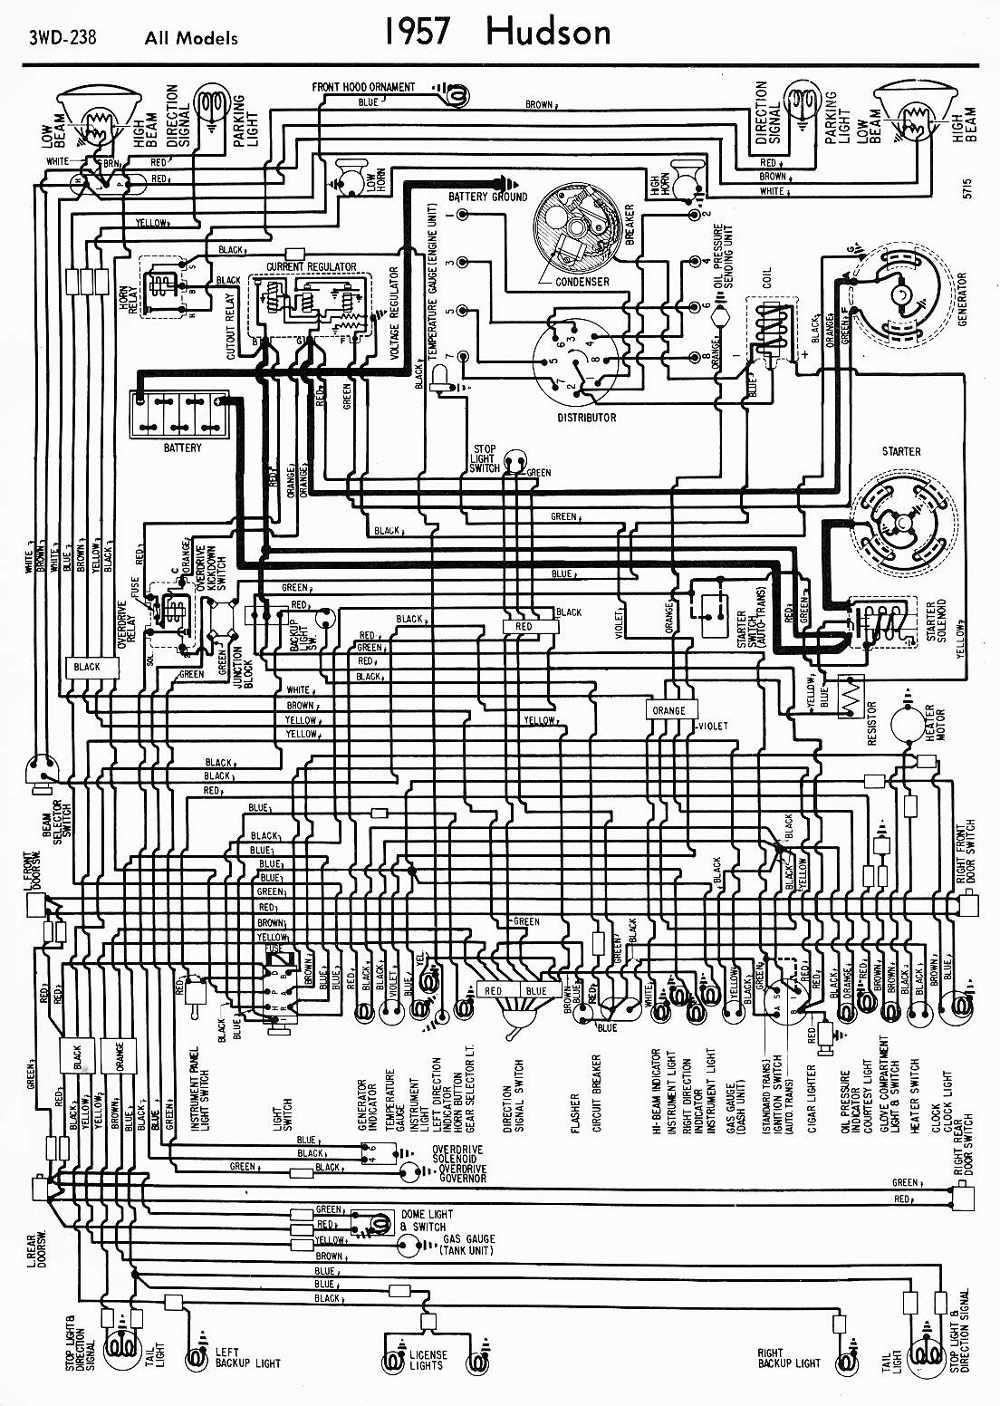 Modern Free Gmc Wiring Diagrams Embellishment - Everything You Need ...